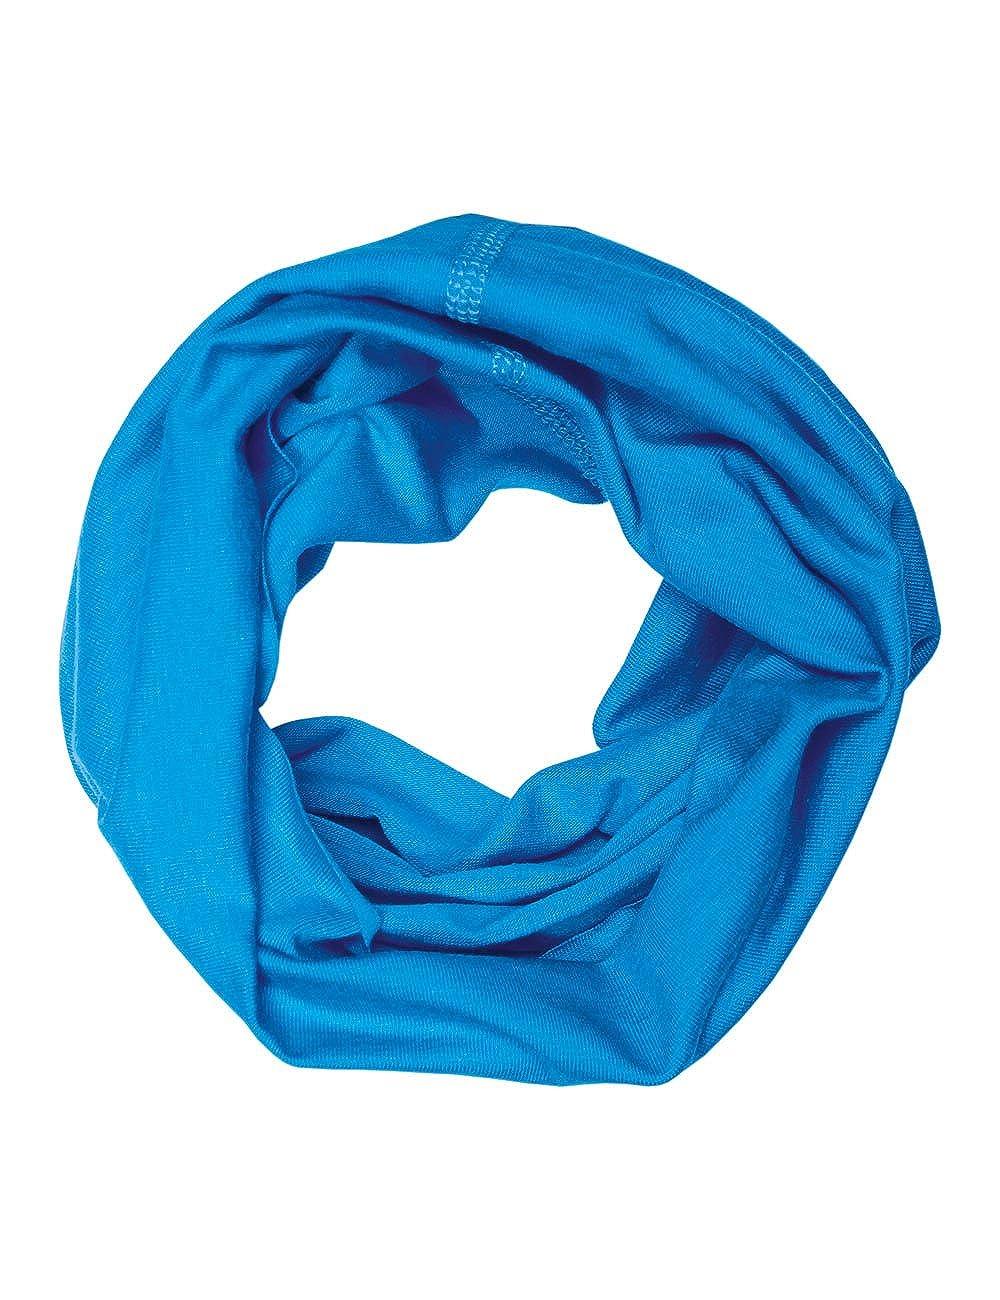 MaxiMo Unisex - Kids Shawl Blue (Ocean Blue) 23600-809500